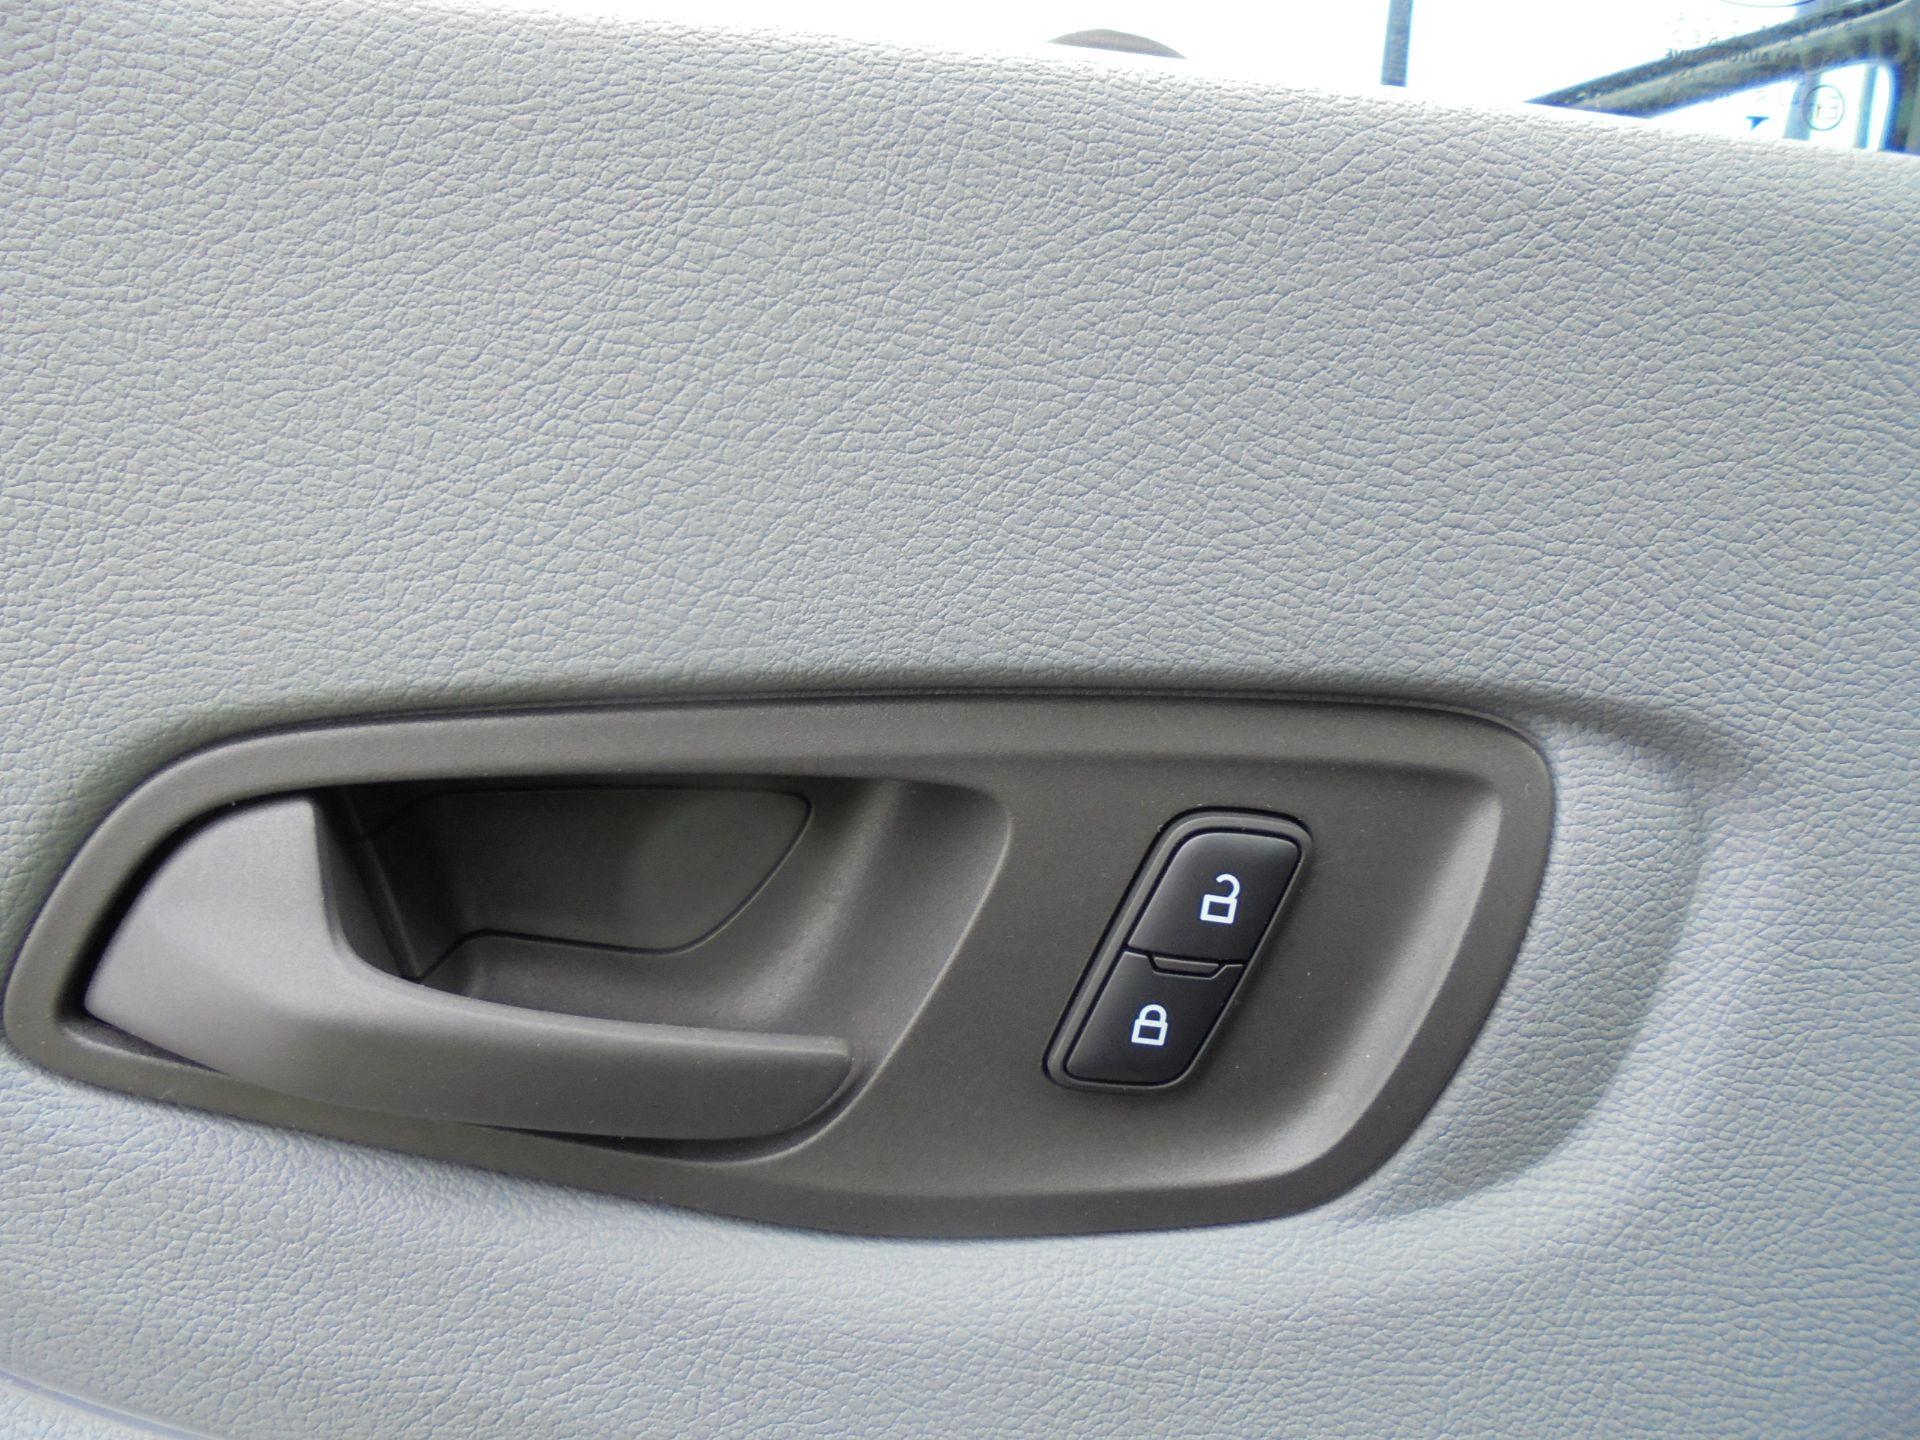 2018 Ford Transit 2.0 Tdci 130Ps H2 D/Cab Van Air/con (WU68PJX) Image 22